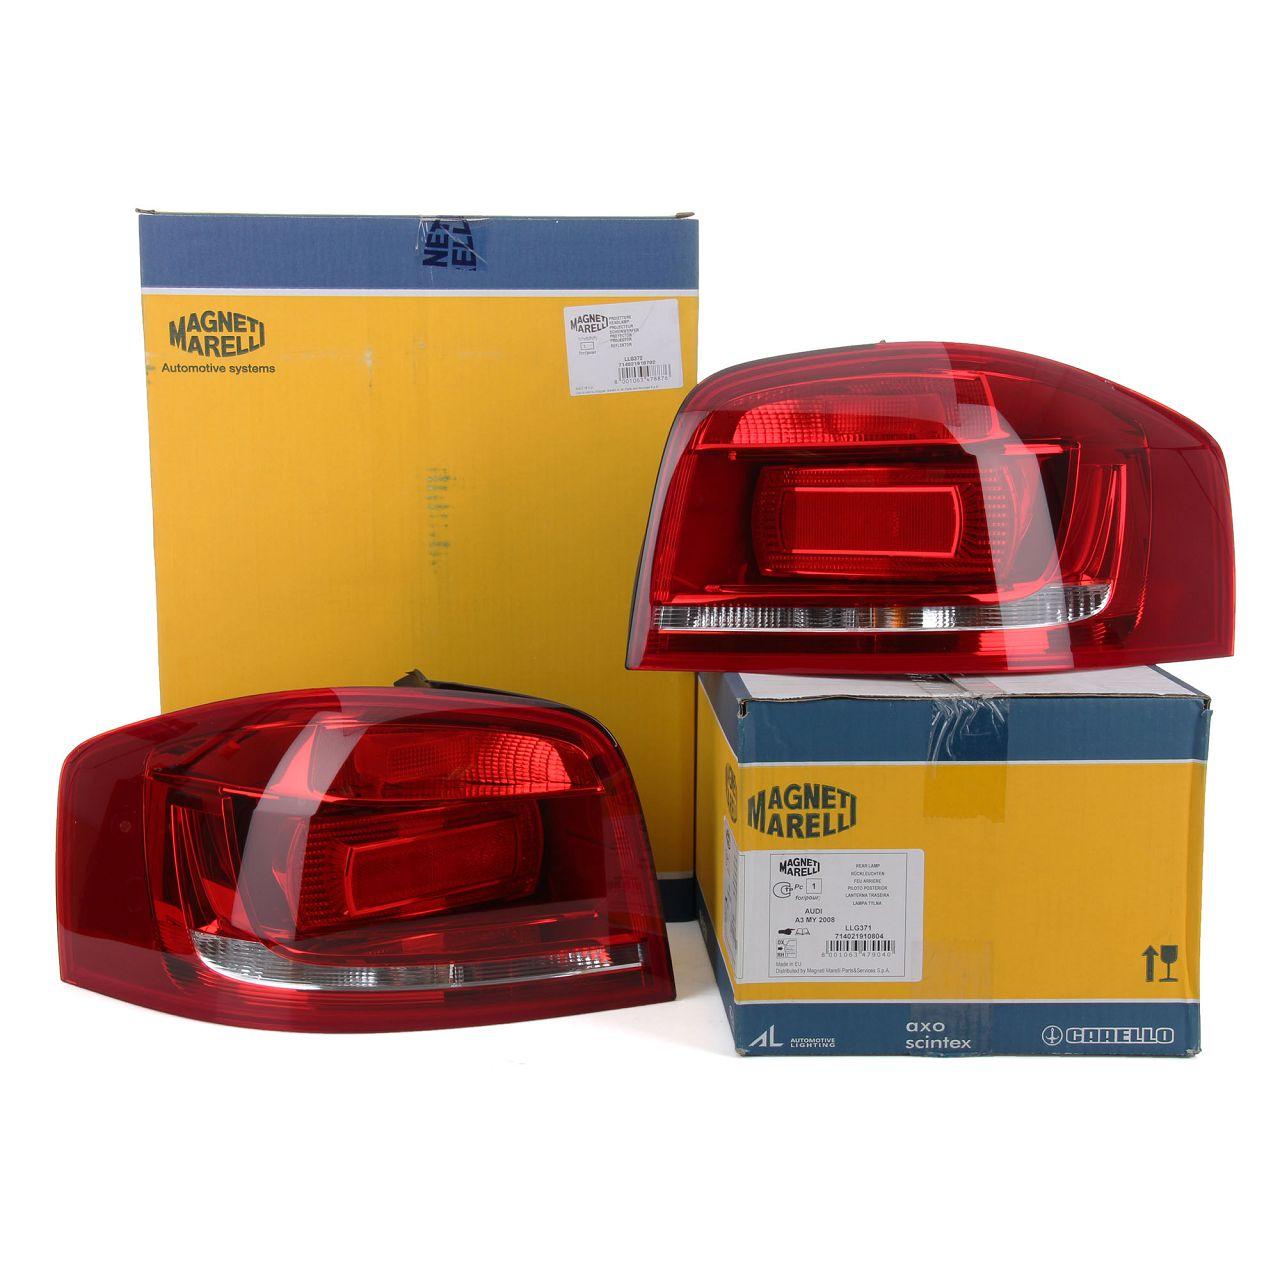 MAGNETI MARELLI Heckleuchte Rückleuchte LED für AUDI A3 S3 (8P1) 3-türig